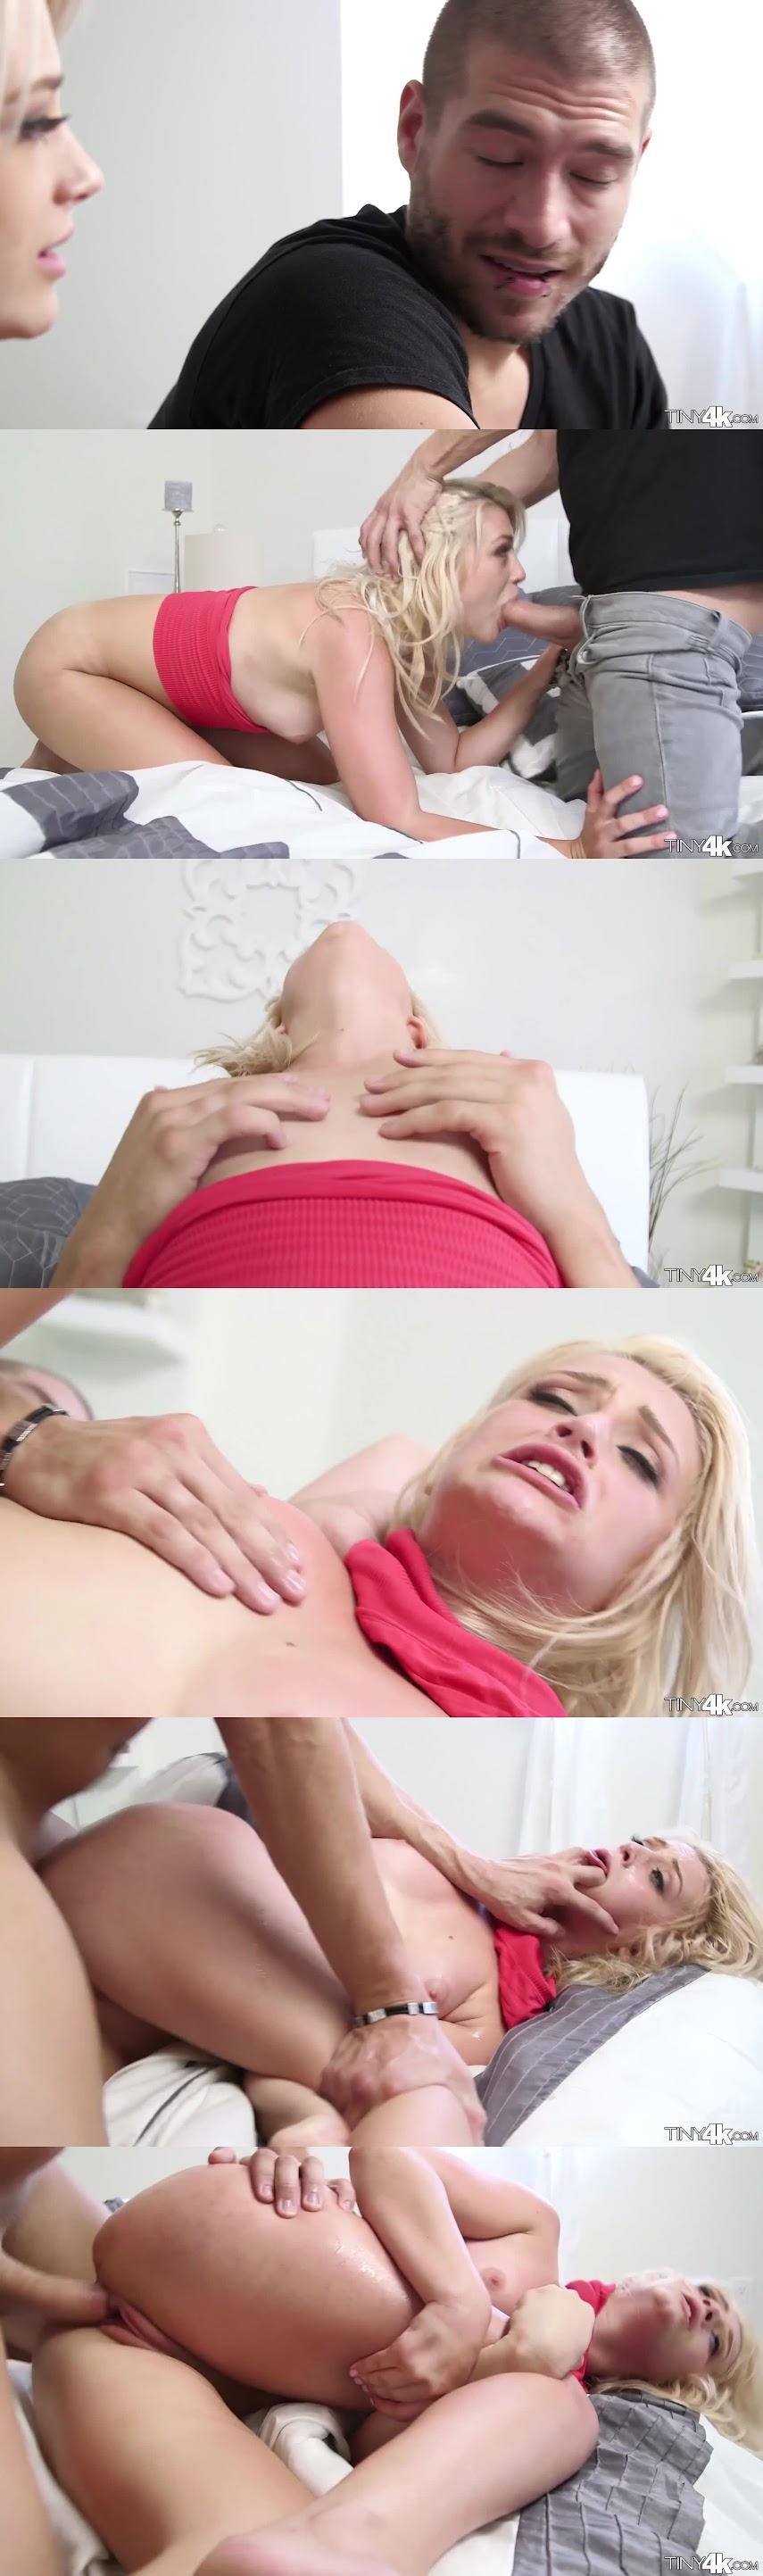 AV Aubrey Gold Blonde Pounding sexy girls image jav